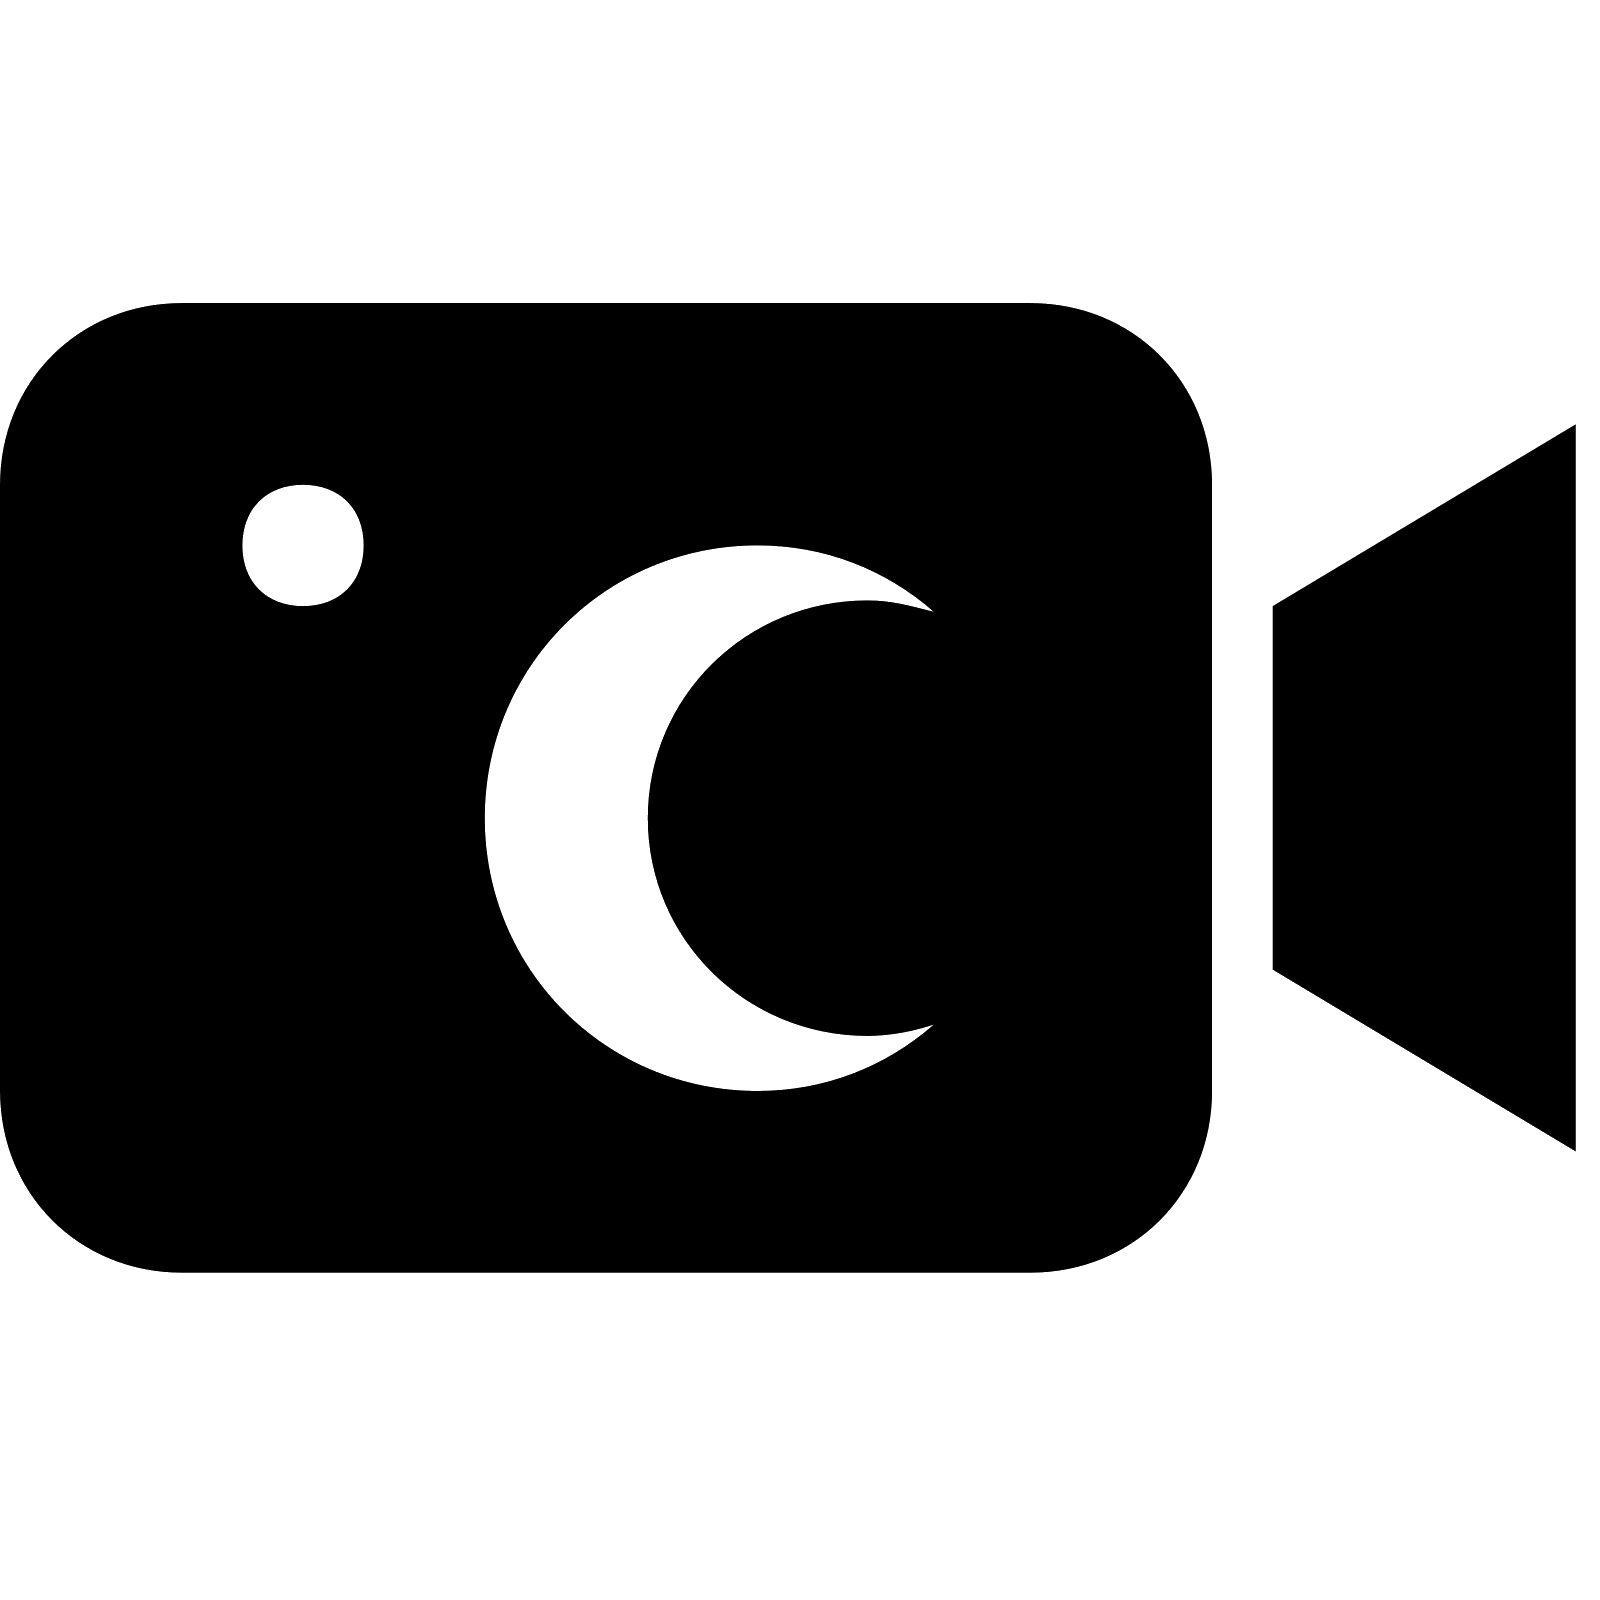 Movie camera computer icons. Vision clipart night vision